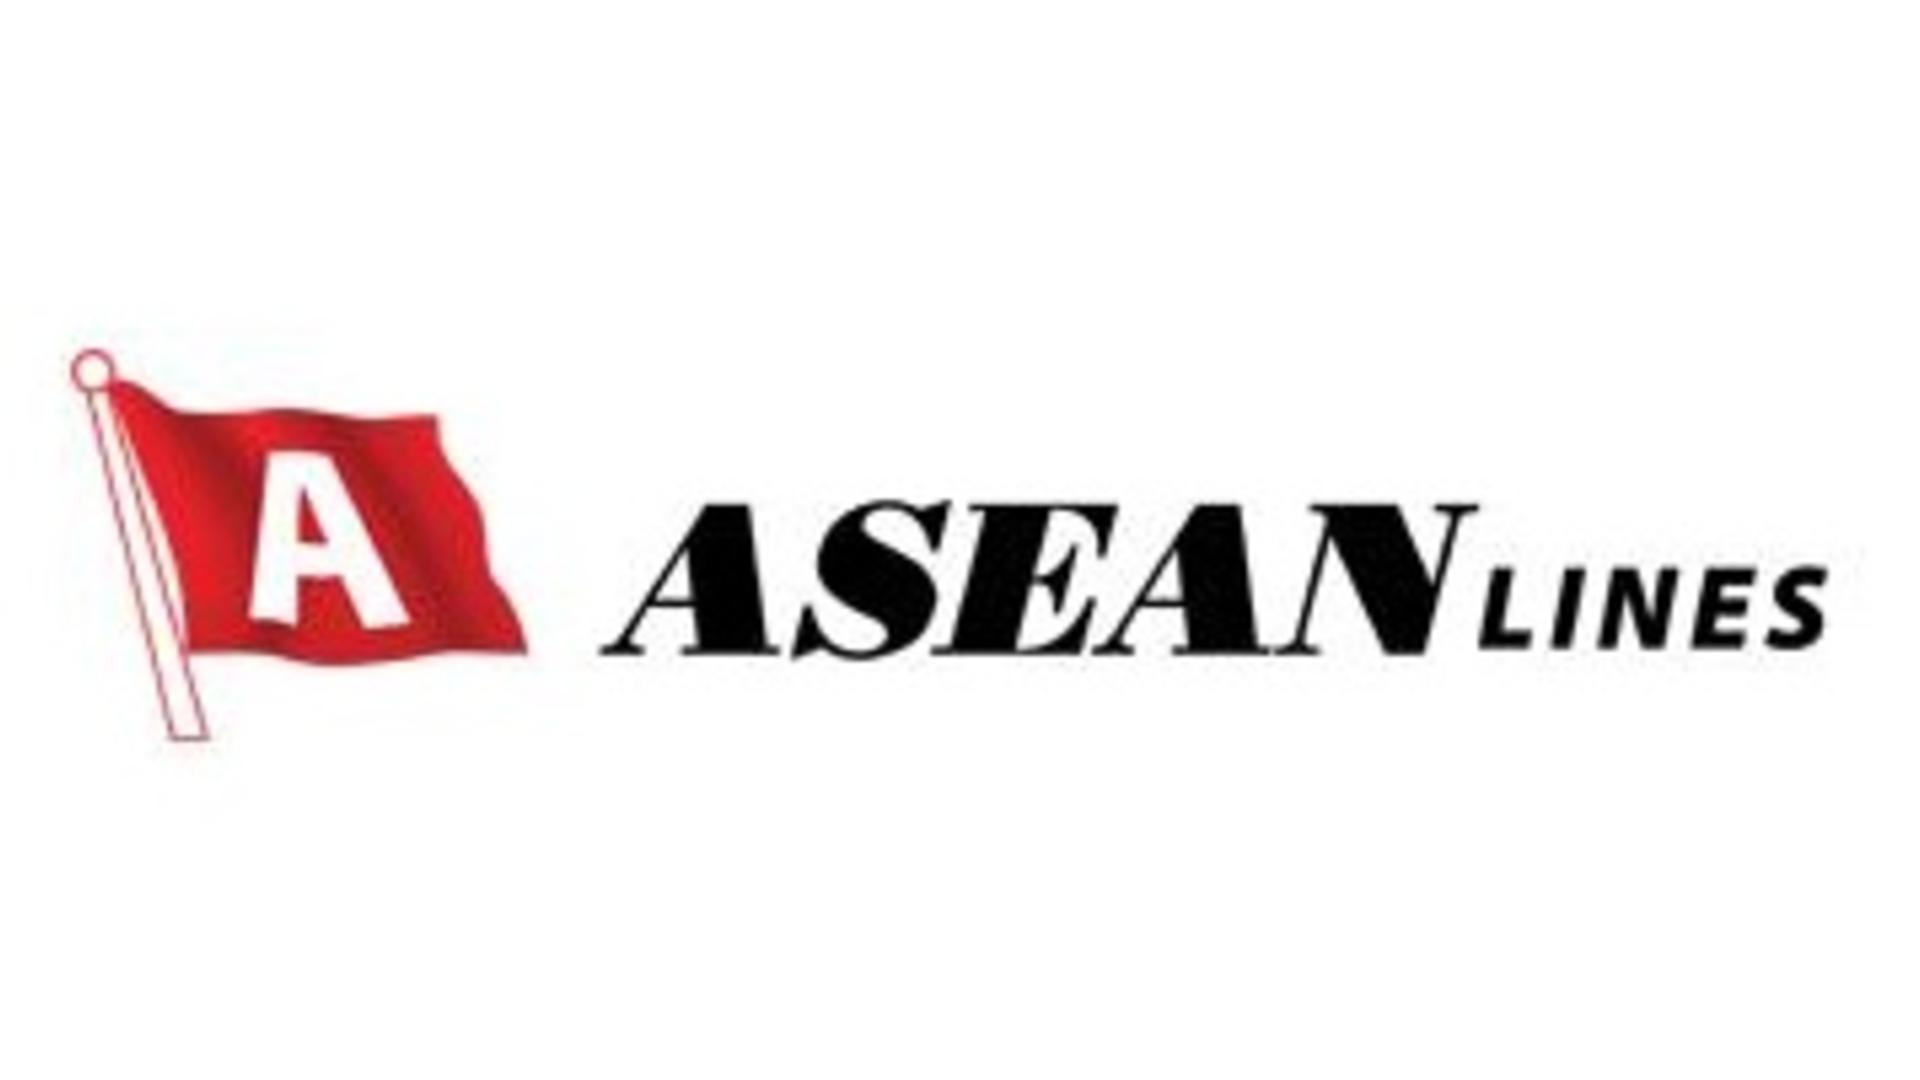 Asean Lines